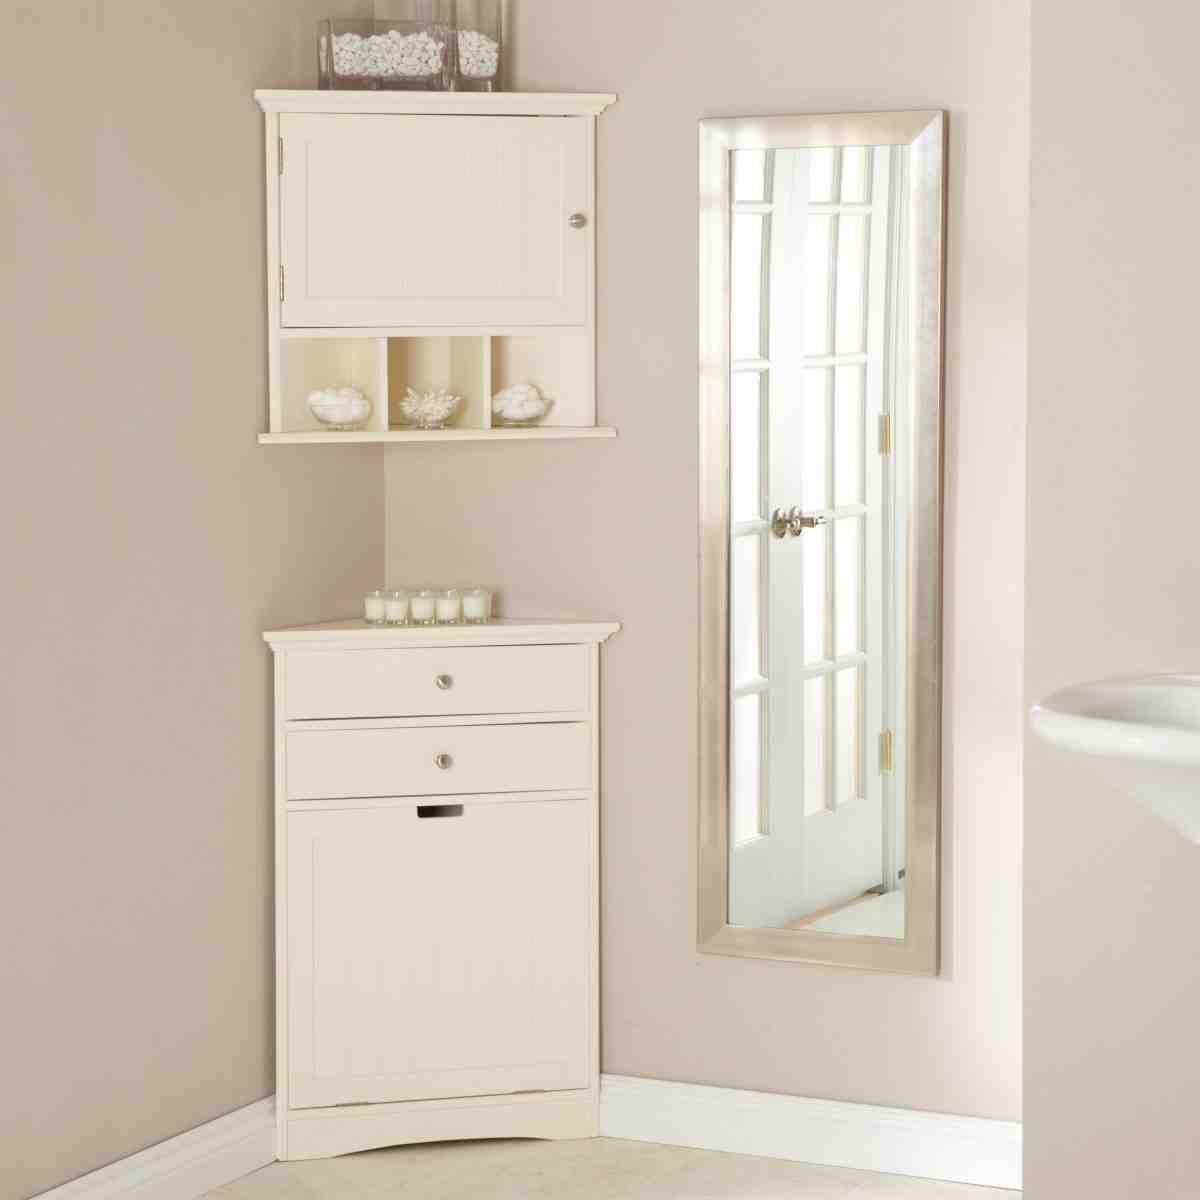 White Bathroom Corner Cabinet Bathroom Corner Cabinet Bathroom Cabinets Designs Corner Storage Cabinet